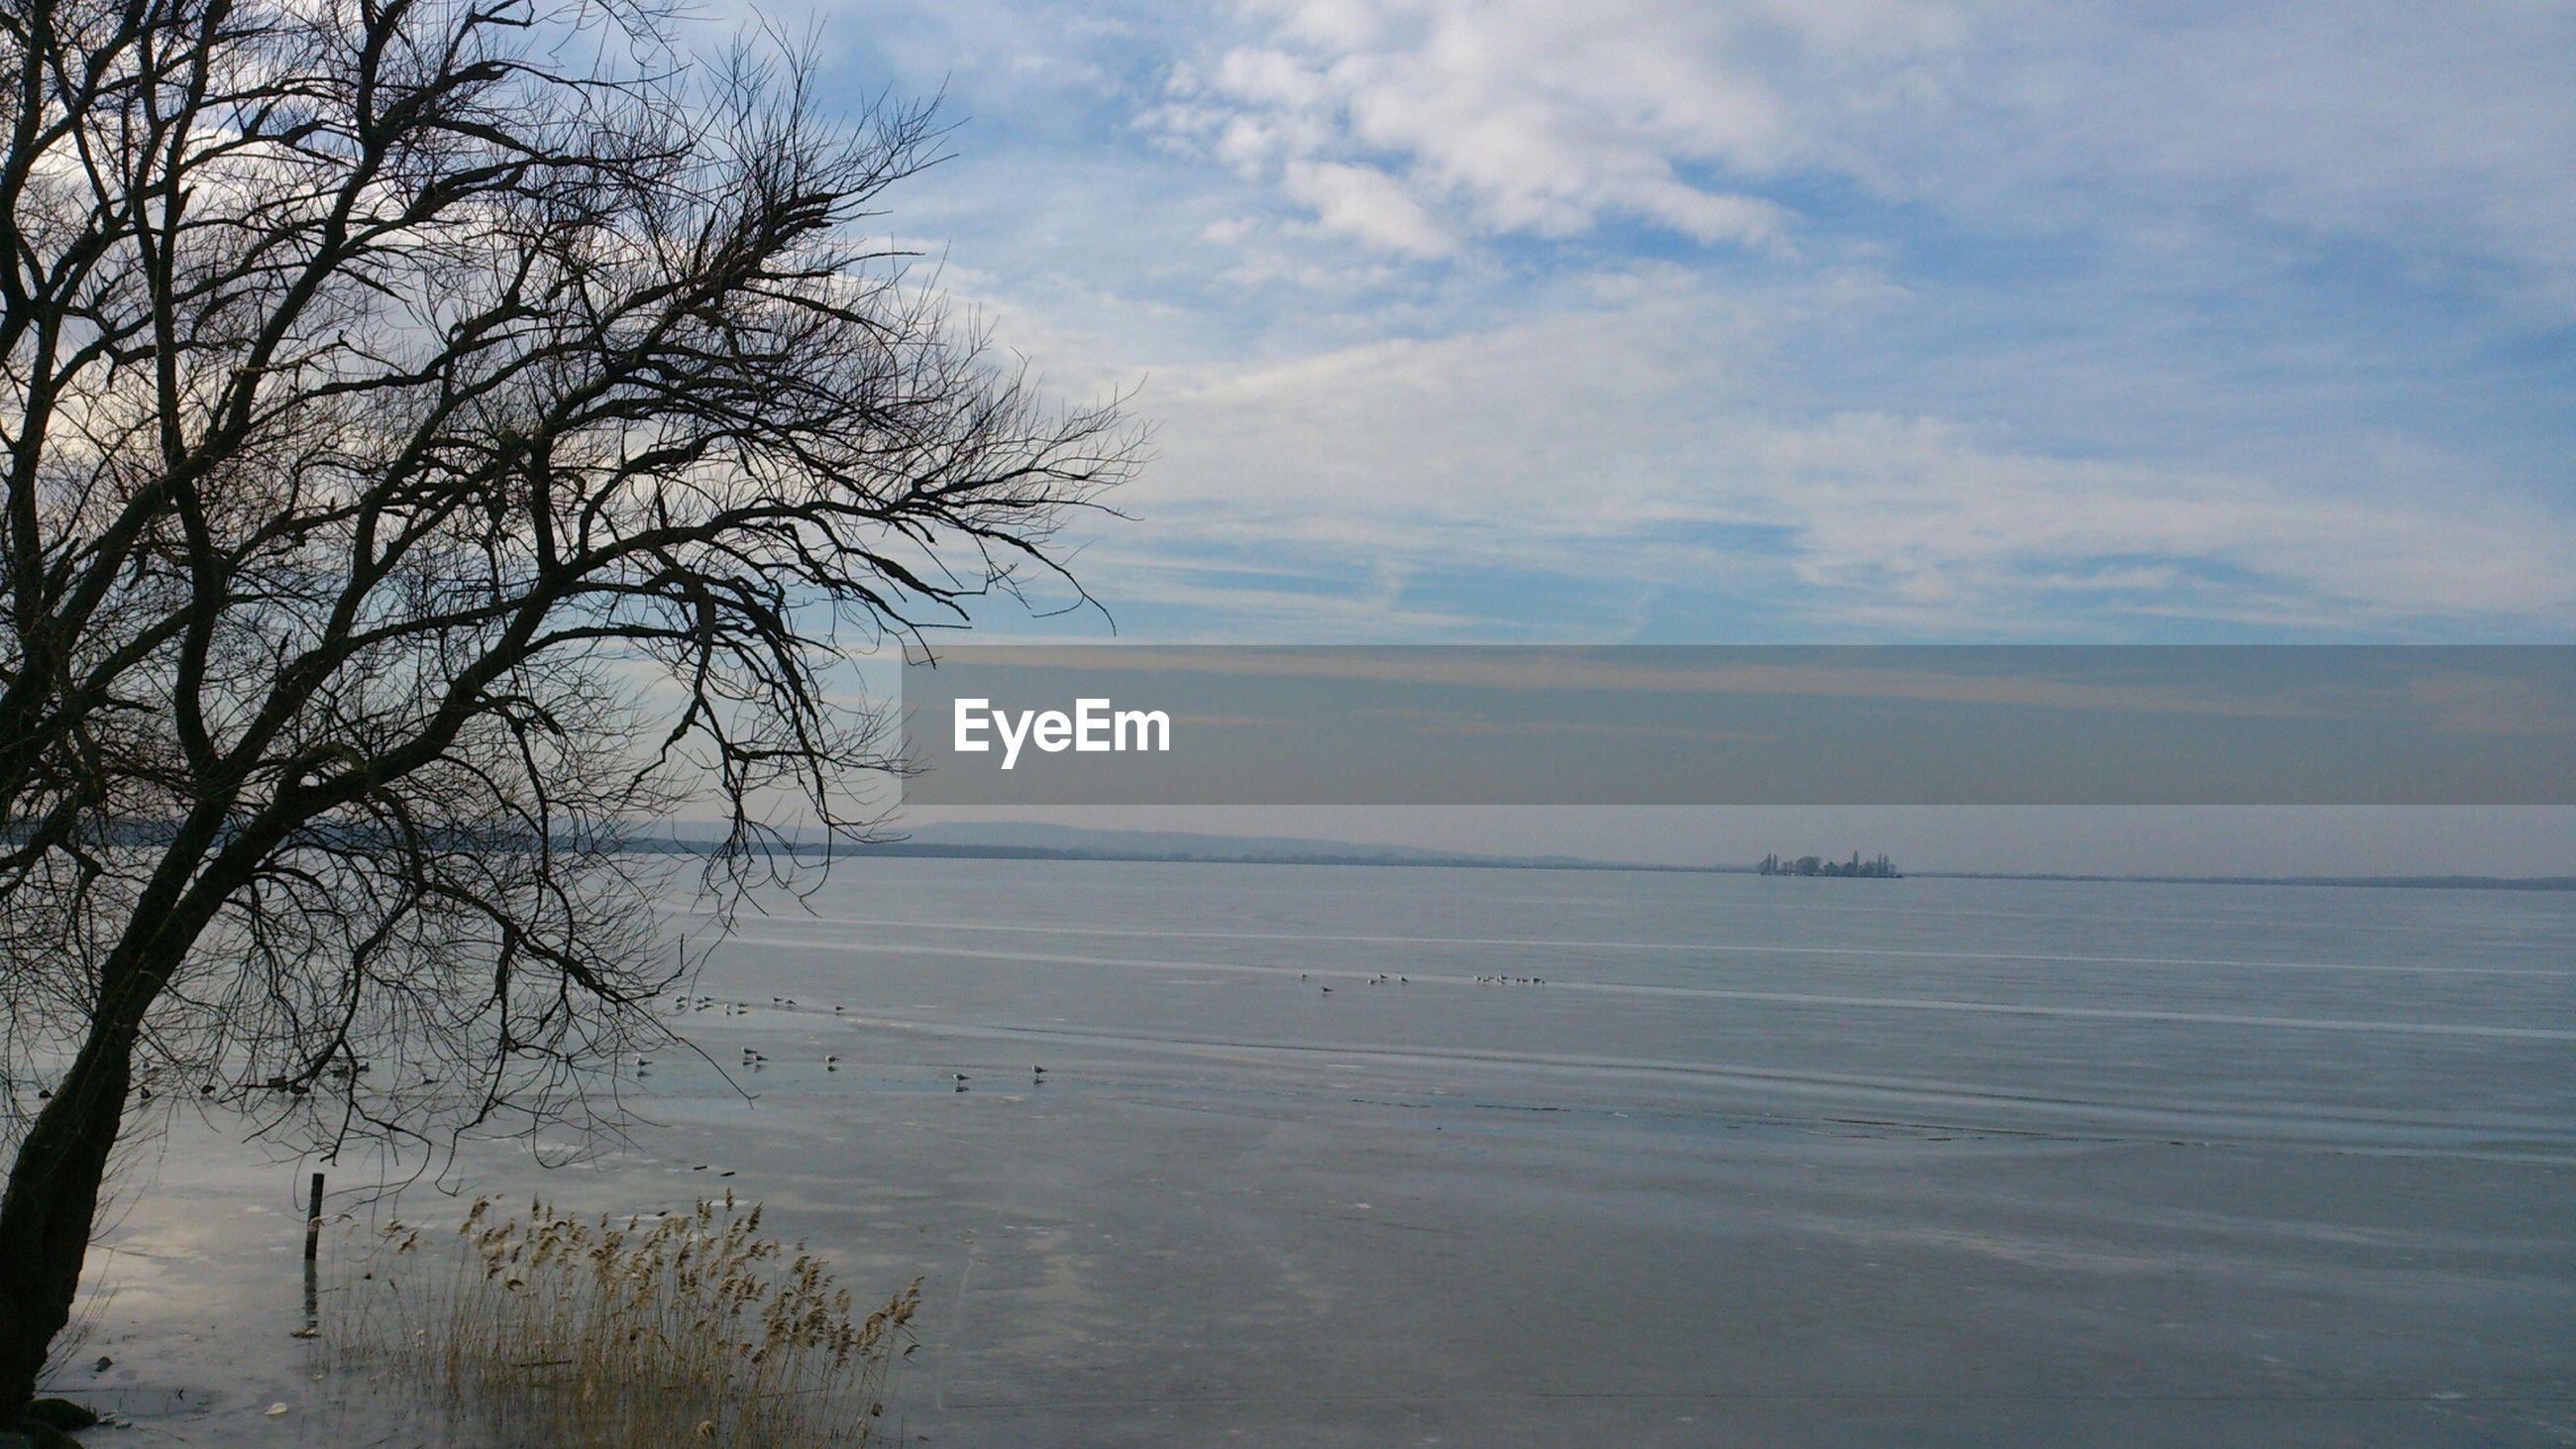 tranquility, sky, water, tranquil scene, tree, scenics, beauty in nature, bare tree, sea, nature, cloud - sky, branch, horizon over water, cloud, idyllic, cloudy, non-urban scene, beach, shore, lake